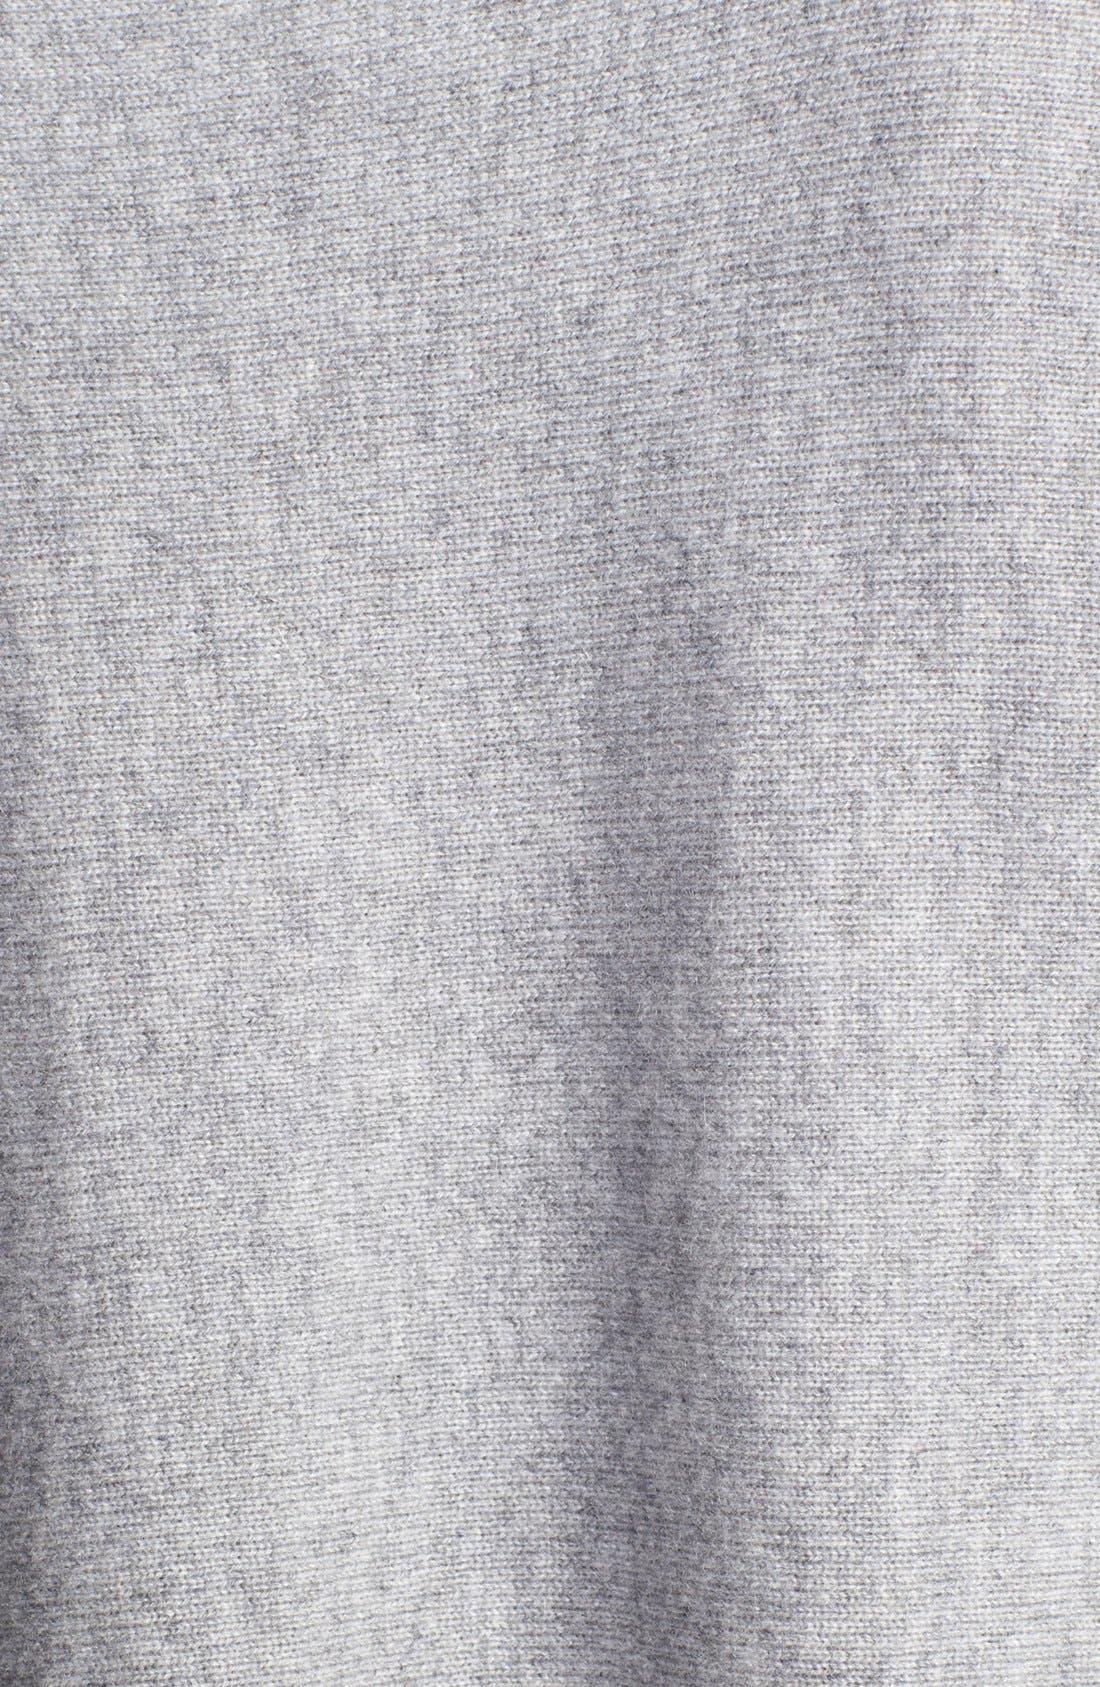 Alternate Image 3  - Eileen Fisher Ballet Neck Cashmere Sweater (Regular & Petite)